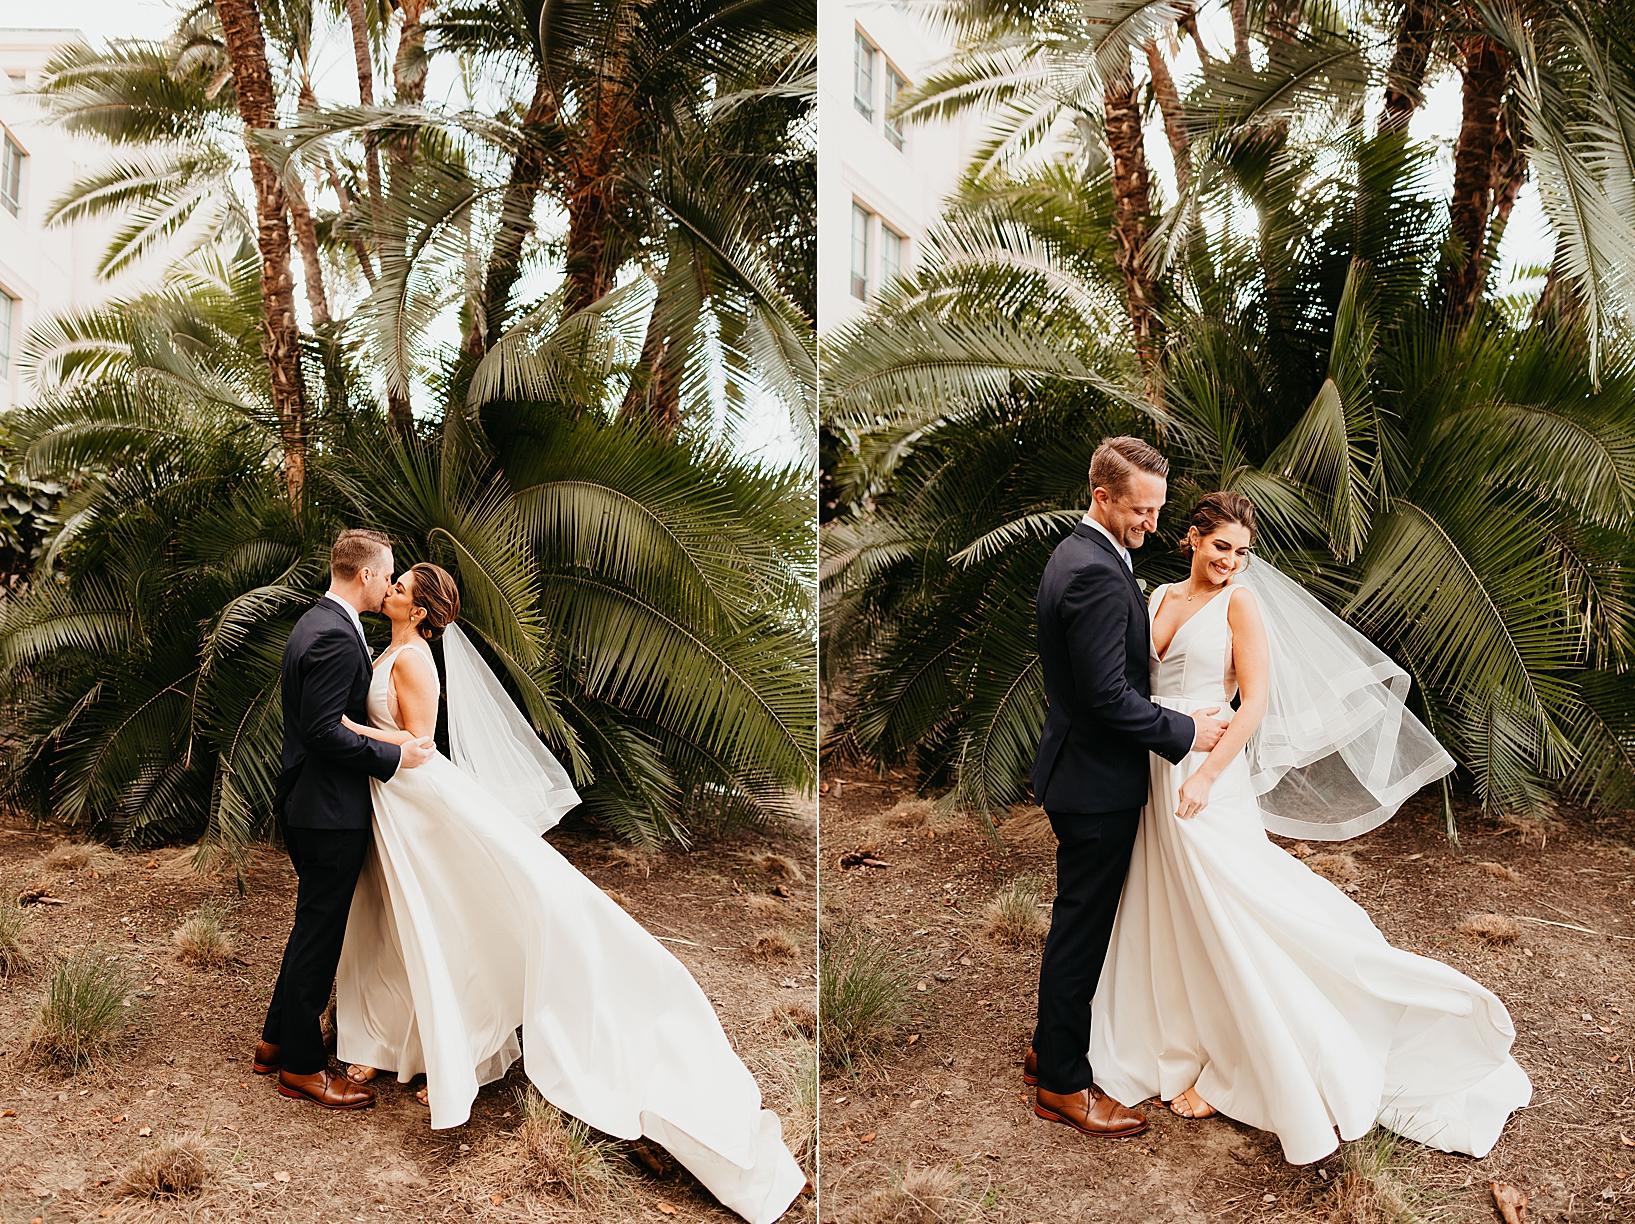 Herb-and-Wood-Wedding-51.jpg